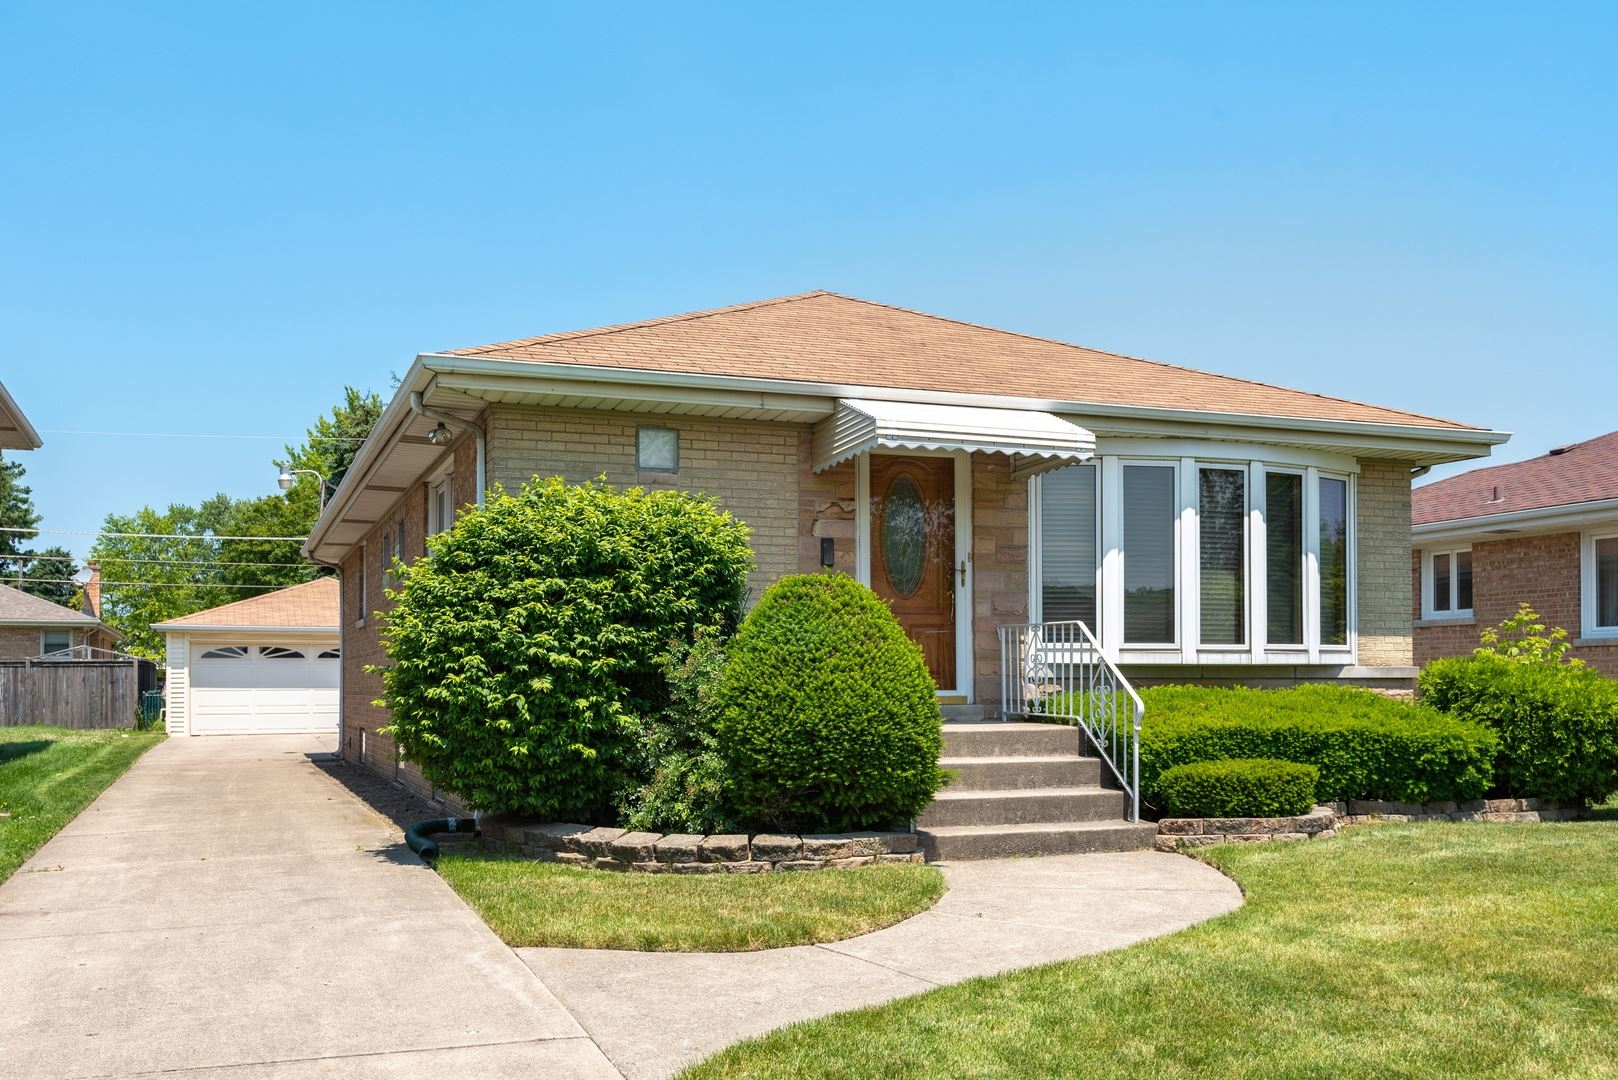 5712 Reba Street, Morton Grove, IL 60053 - #: 10715393